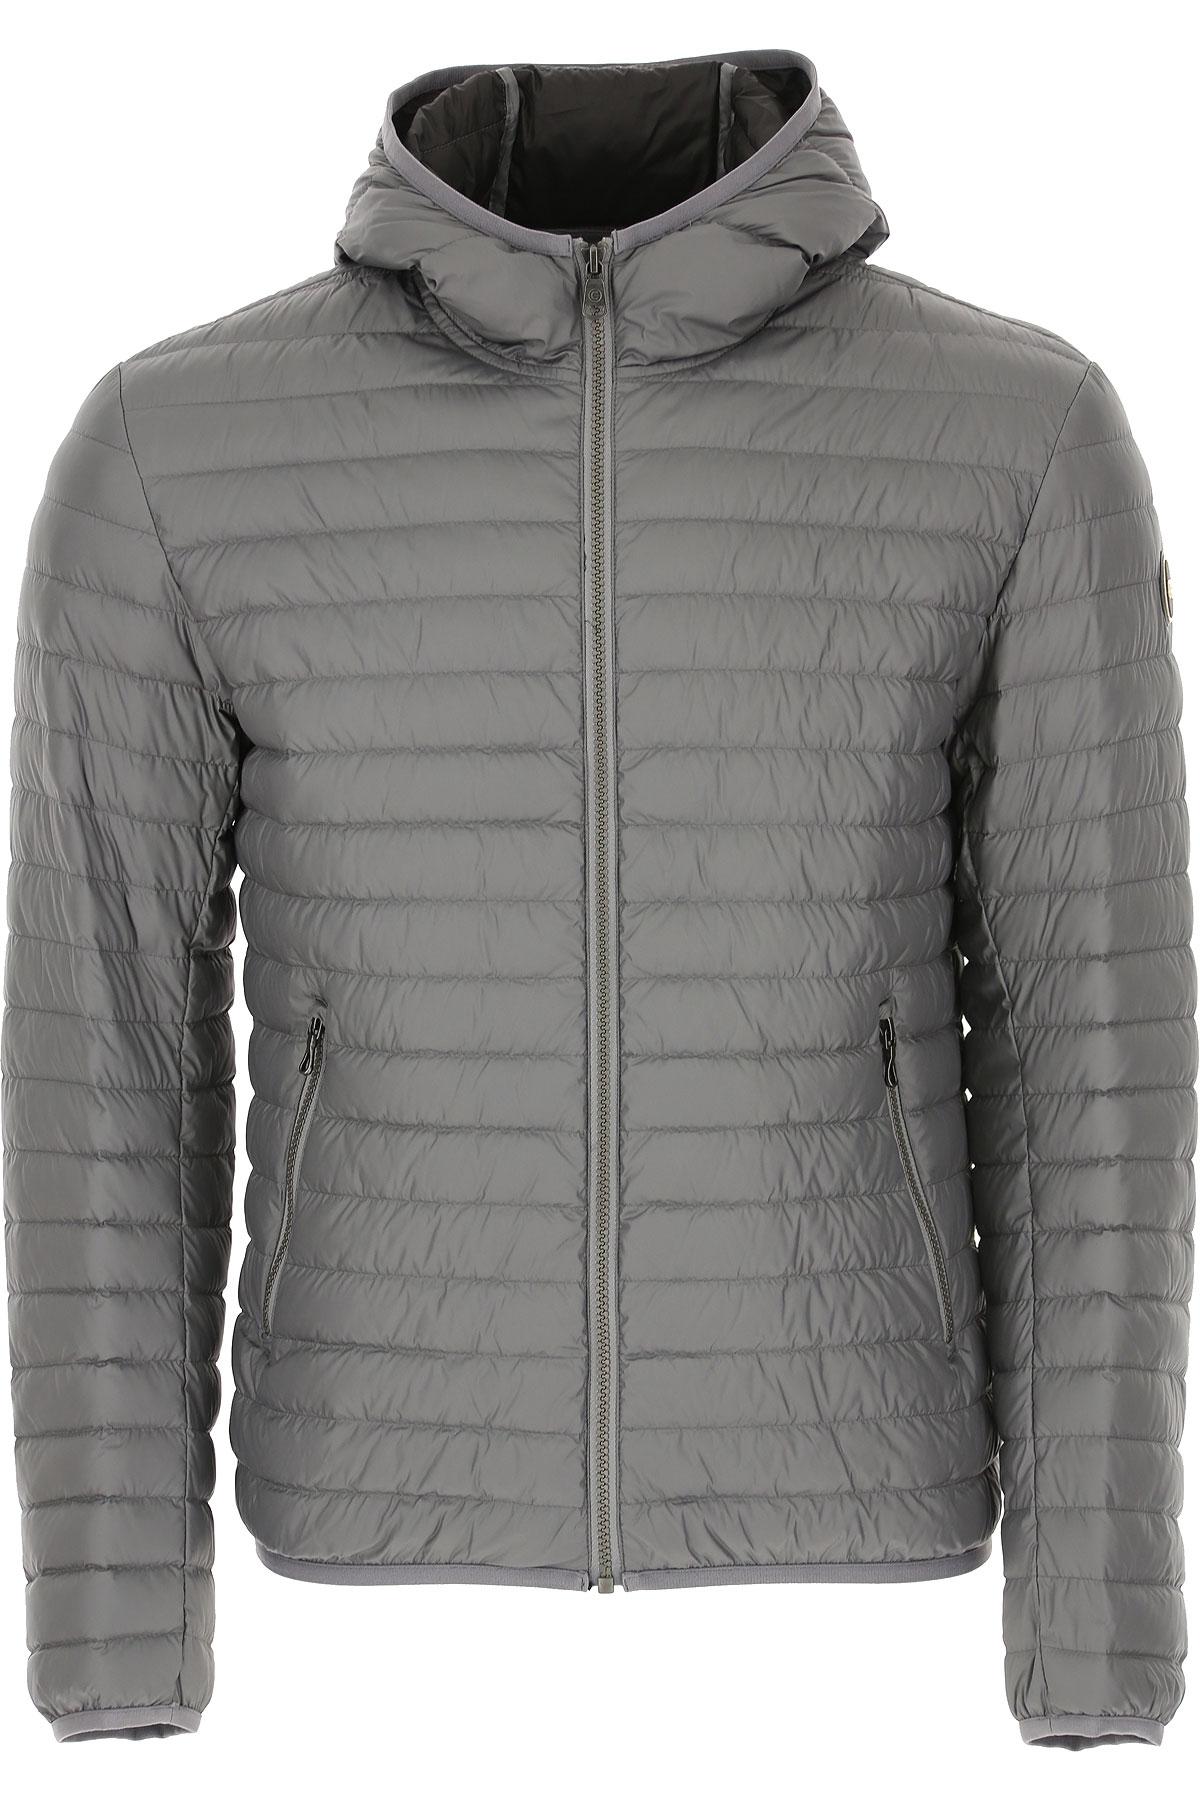 Colmar Down Jacket for Men, Puffer Ski Jacket On Sale, Medium Grey, polyester, 2019, L S XL XS XXL XXXL